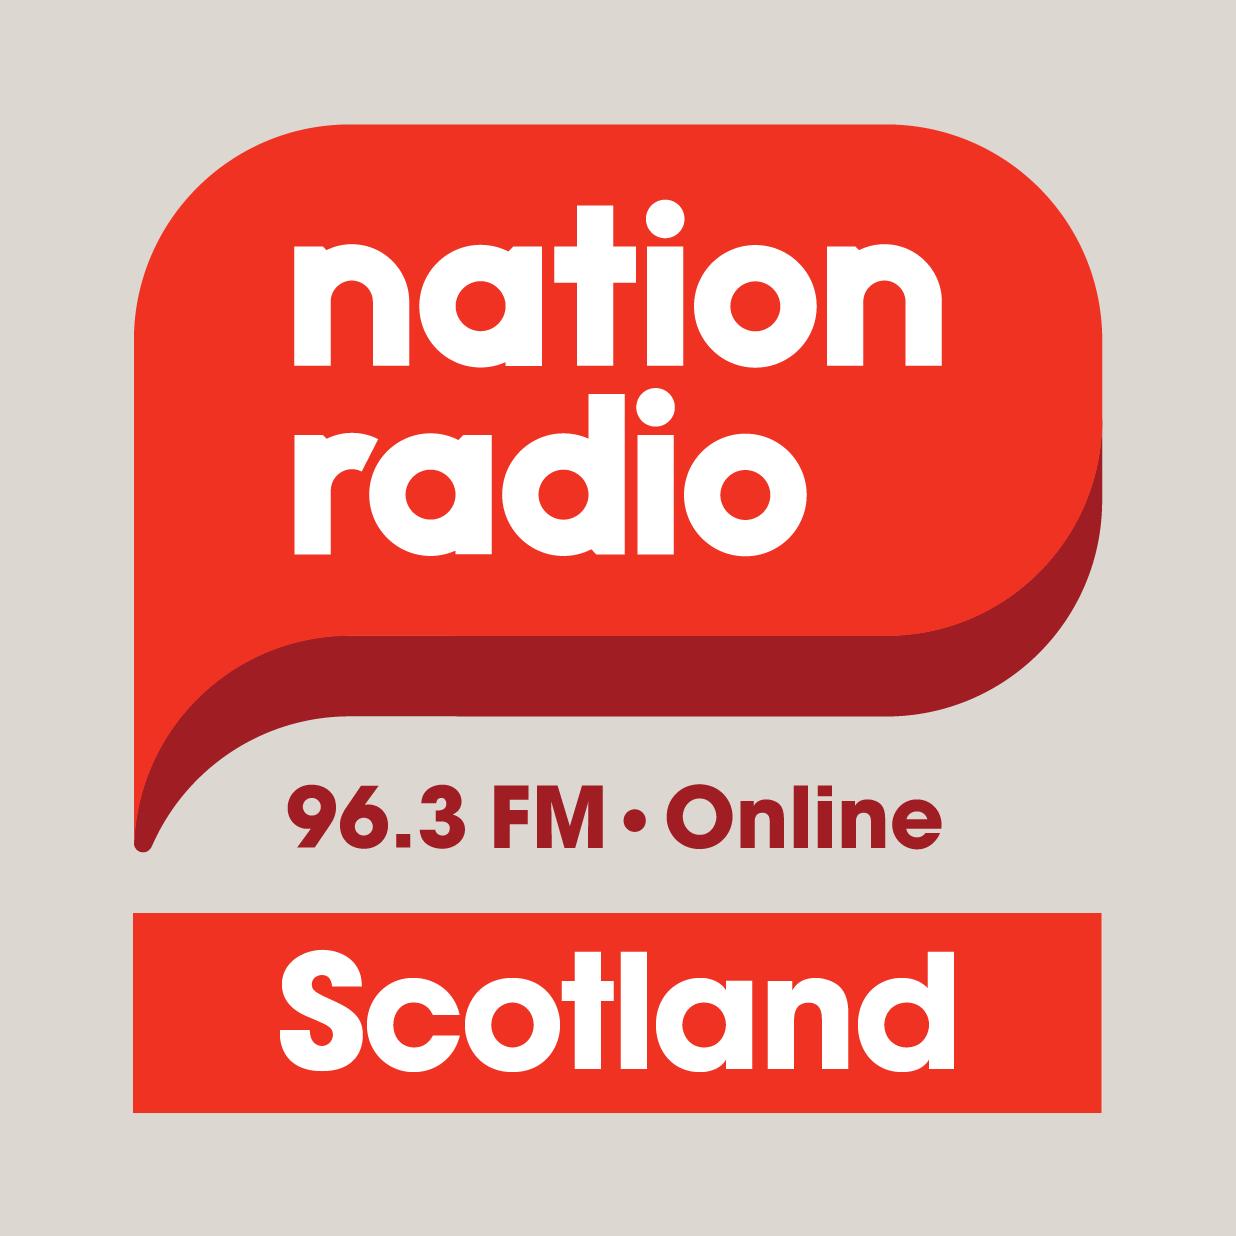 Nation Radio Scotland